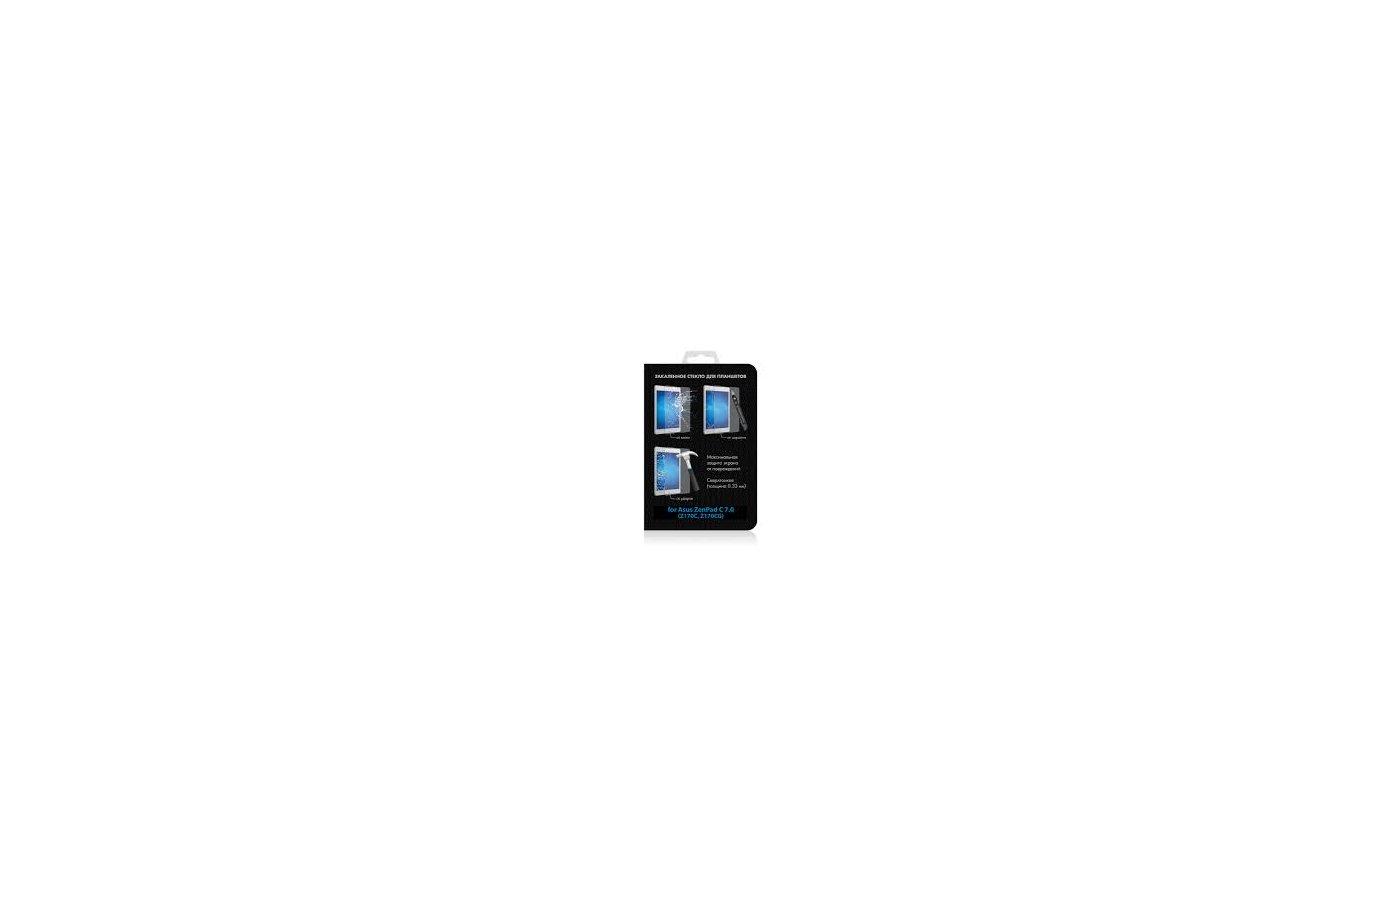 Защитная пленка DF Стекло для Samsung Galaxy Tab E 9.6 sSteel-30